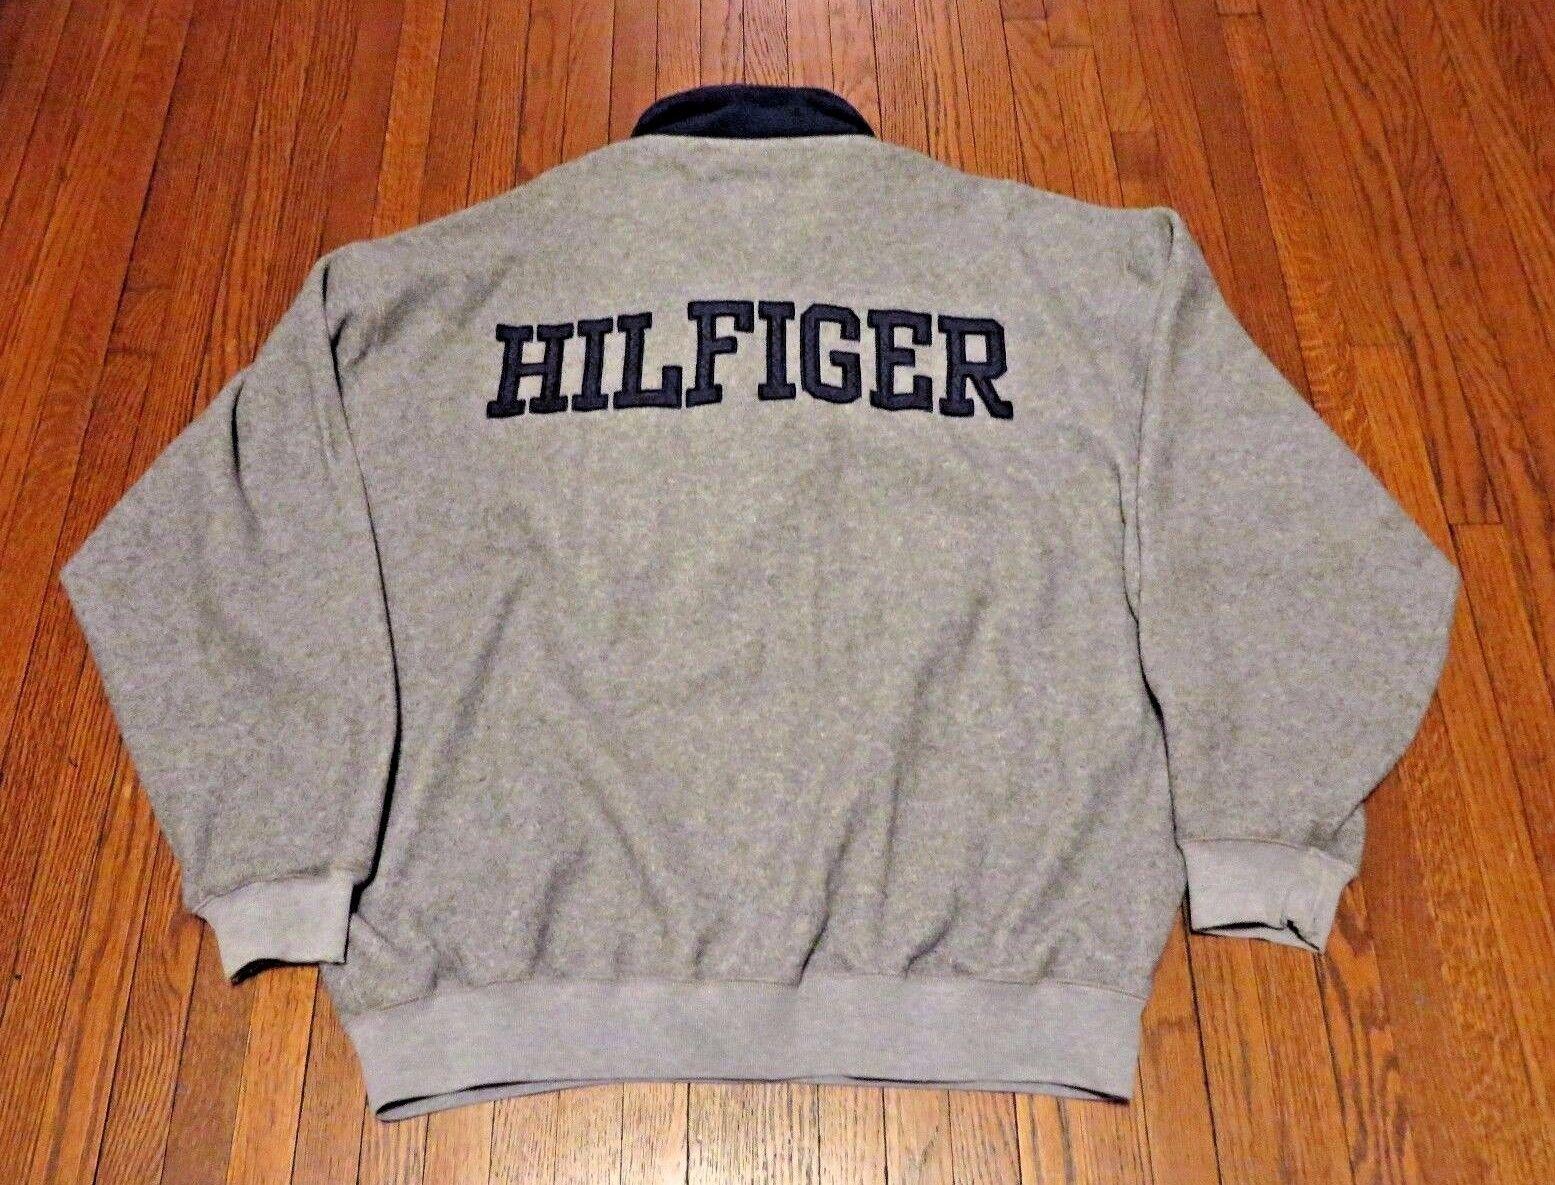 VTG 90's Tommy Hilfiger Athletics Spell Out Grau 1/2 Zip Fleece Pulllover sz XL